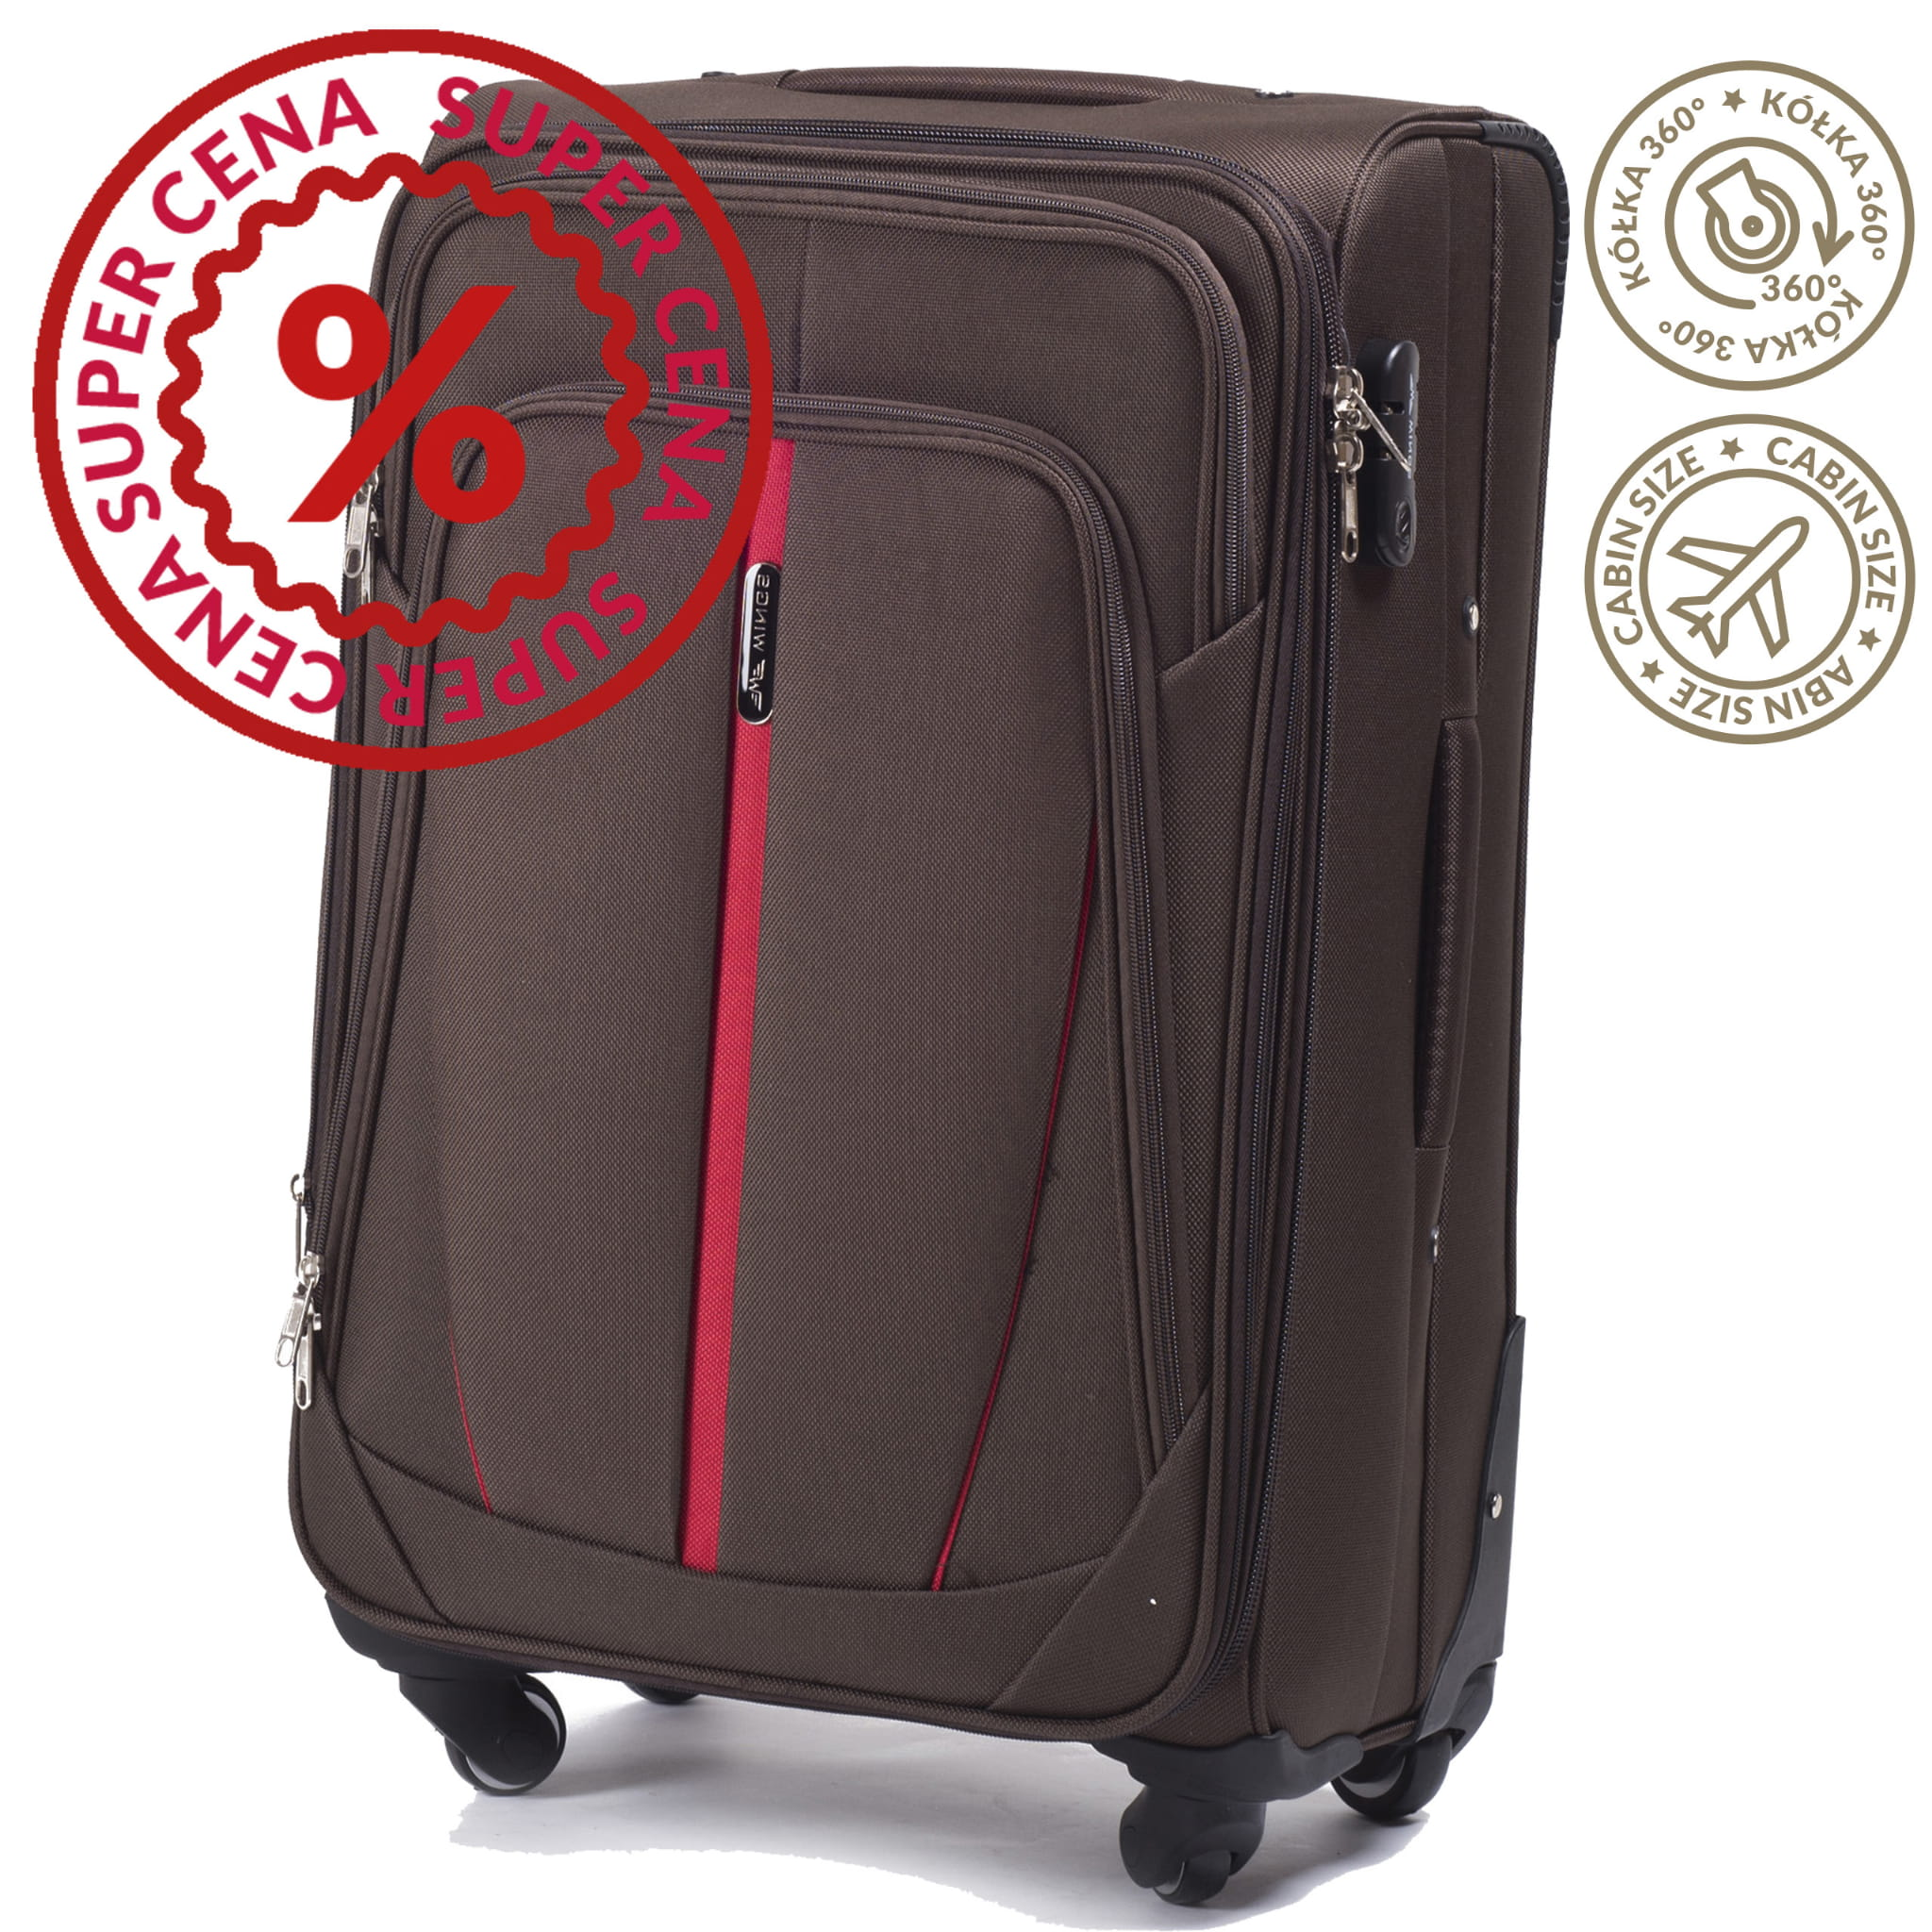 Малый Тканевый Чемодан Wings 1706-4 S COFFE PREMIUM на 4-х прочных колесах! Для багажа,до 10 кг